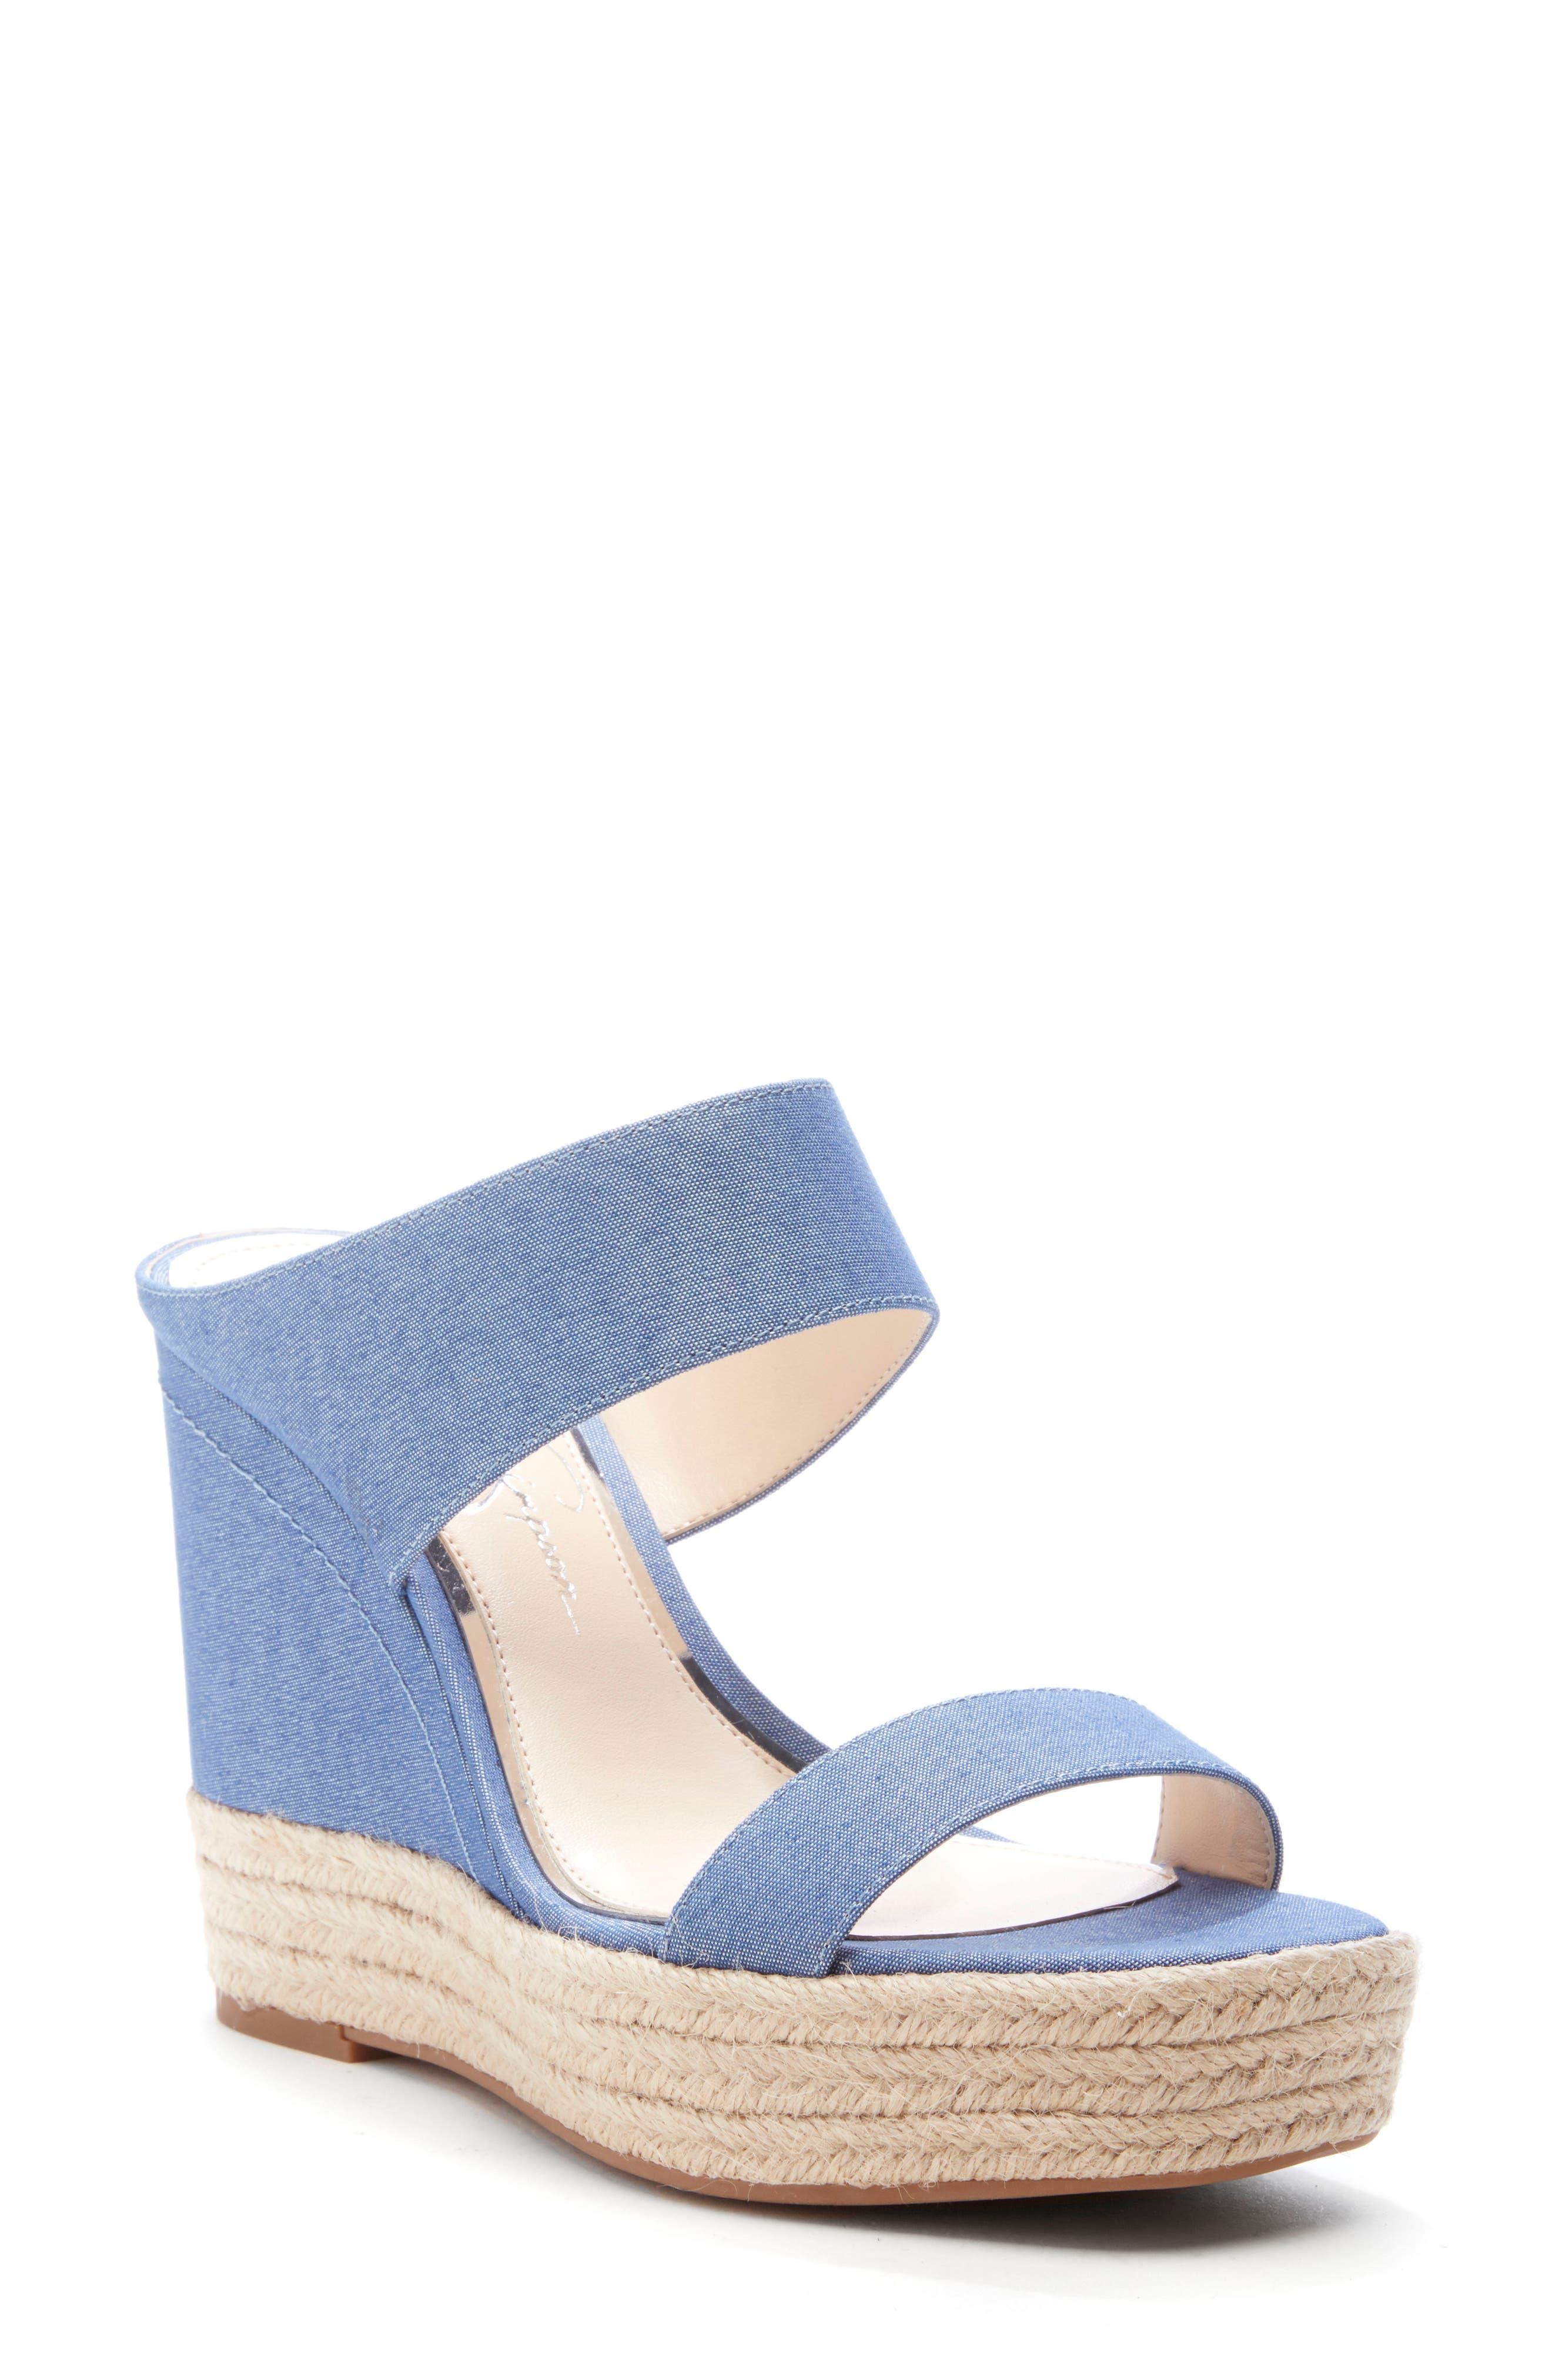 Jessica Simpson Siera Espadrille Wedge Slide Sandal, Blue/green